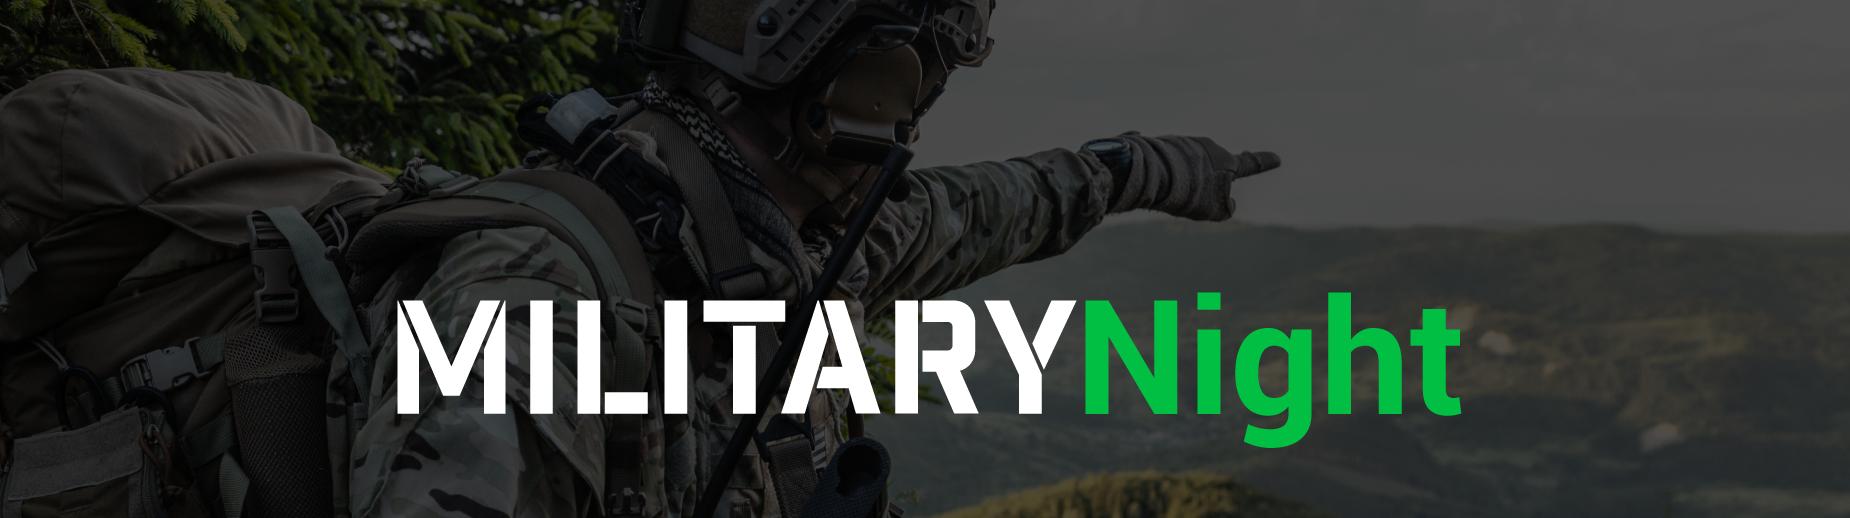 Military Night Banner